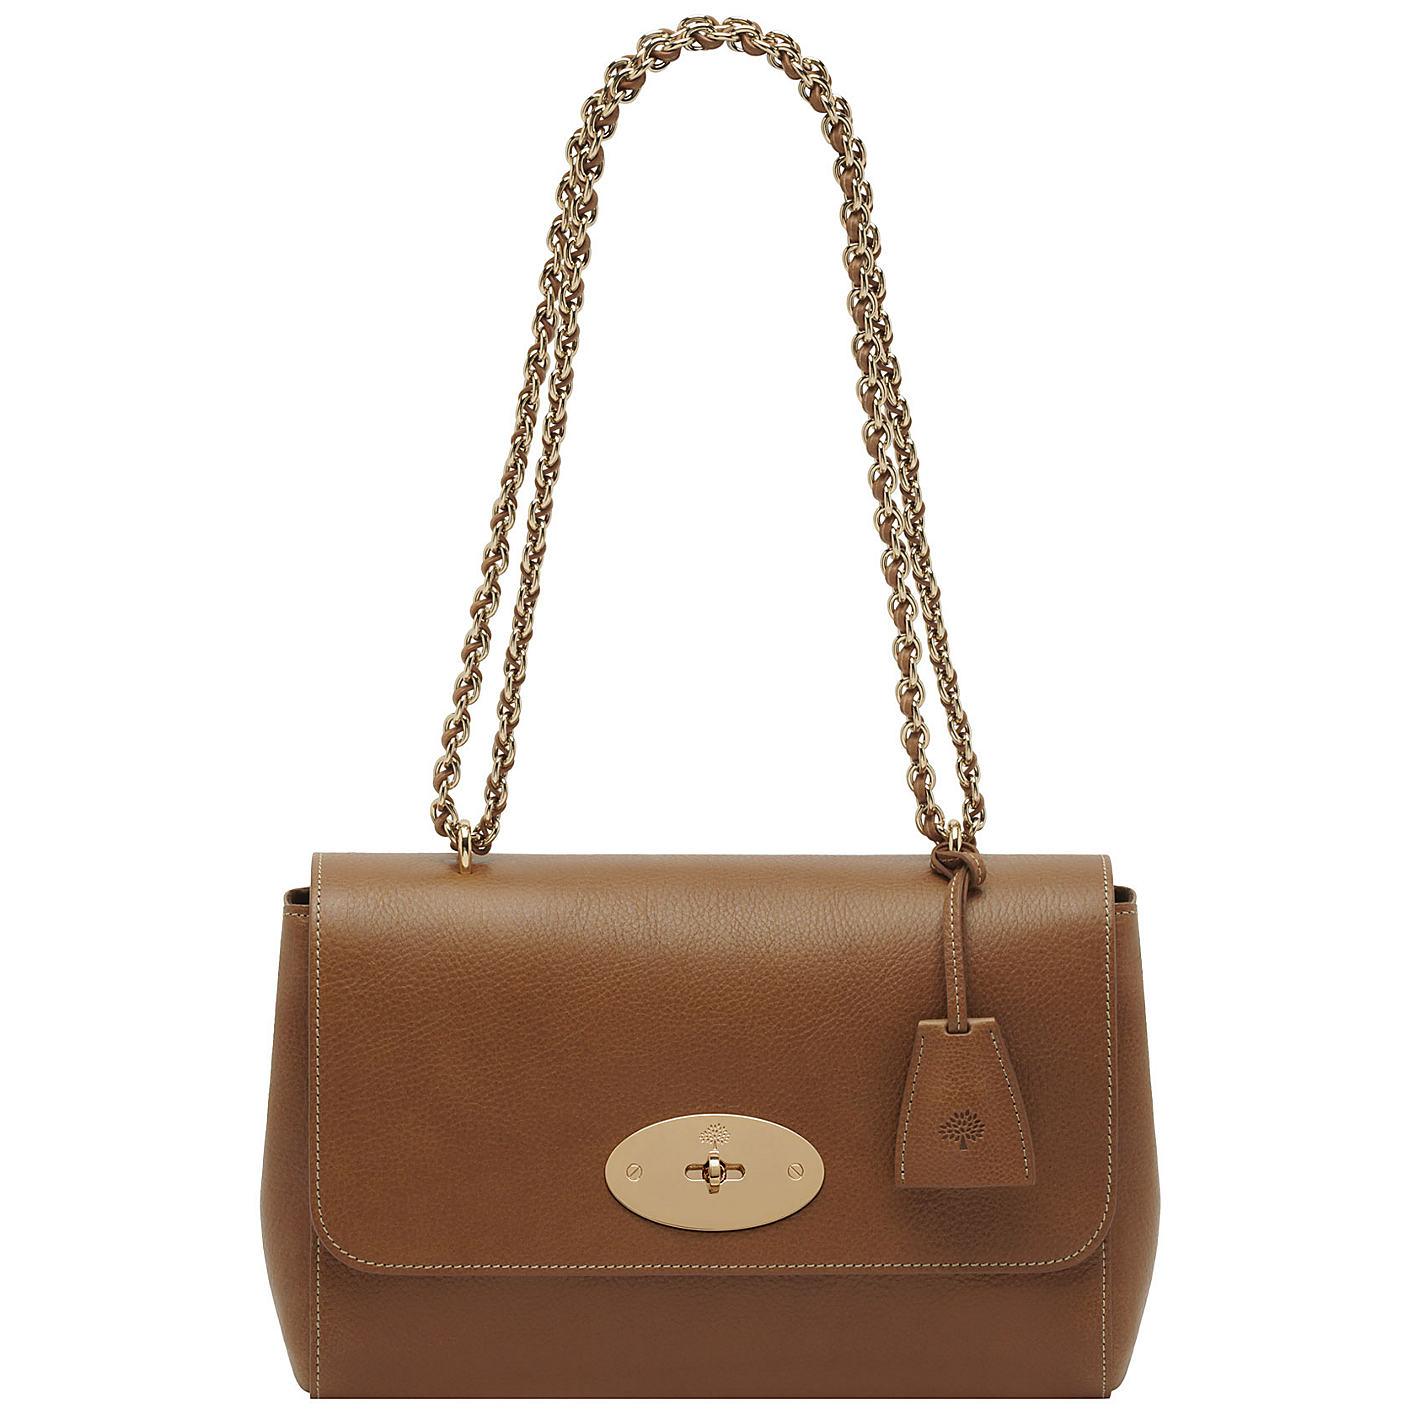 Handbags Shoulder Bags Designer Leather Handbags John Lewis 82